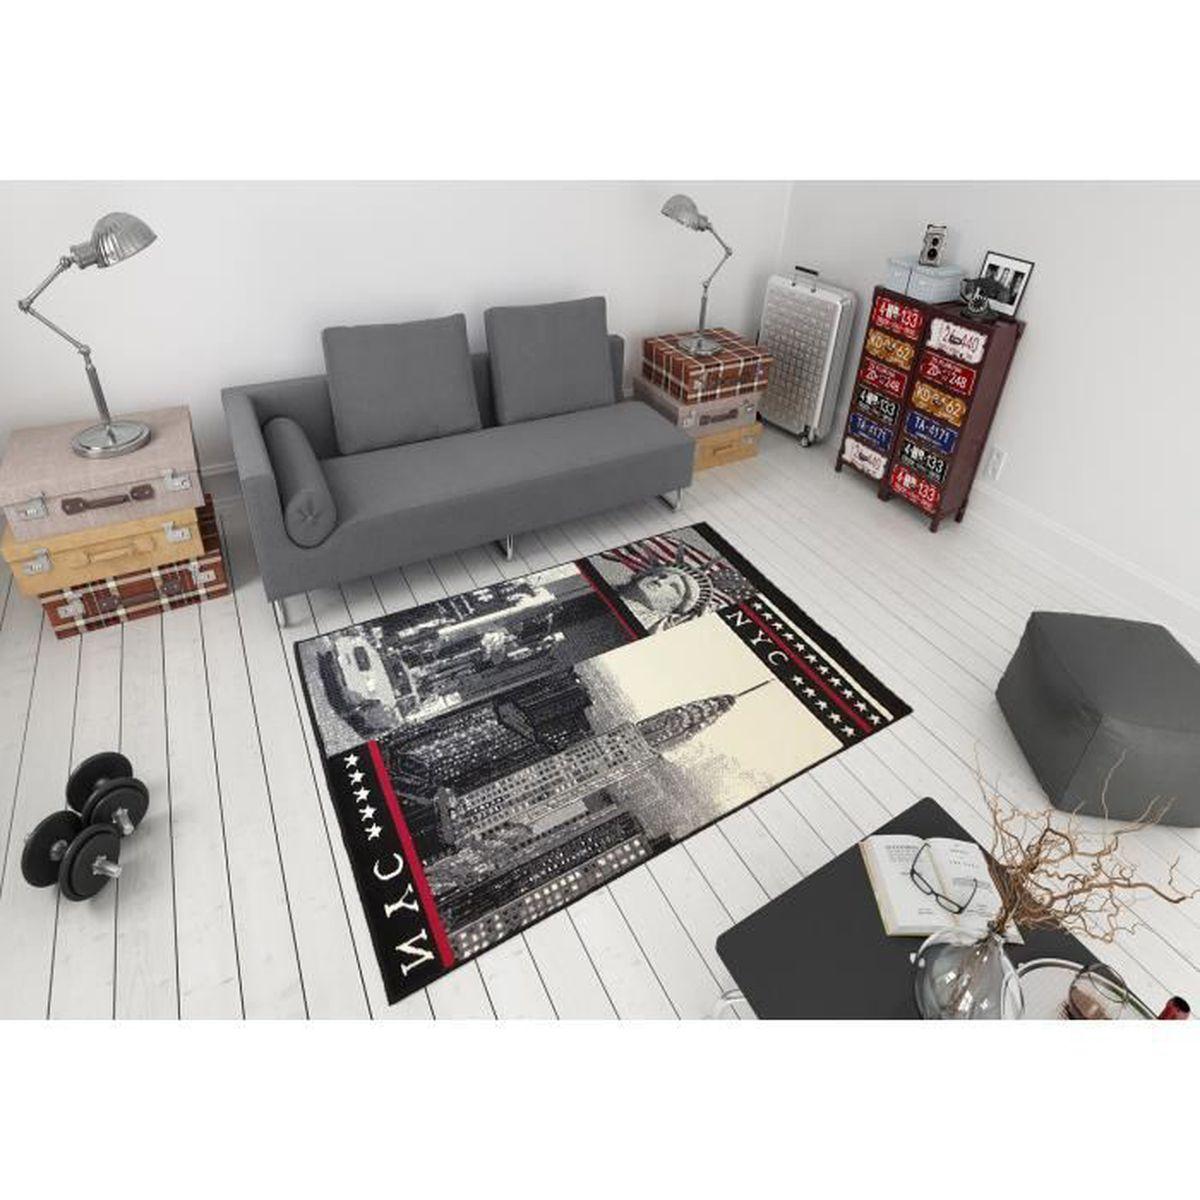 Tapis Salon New York Nyc Gris Rouge Debonsol 120x170cm Achat Vente Tapis Cdiscount